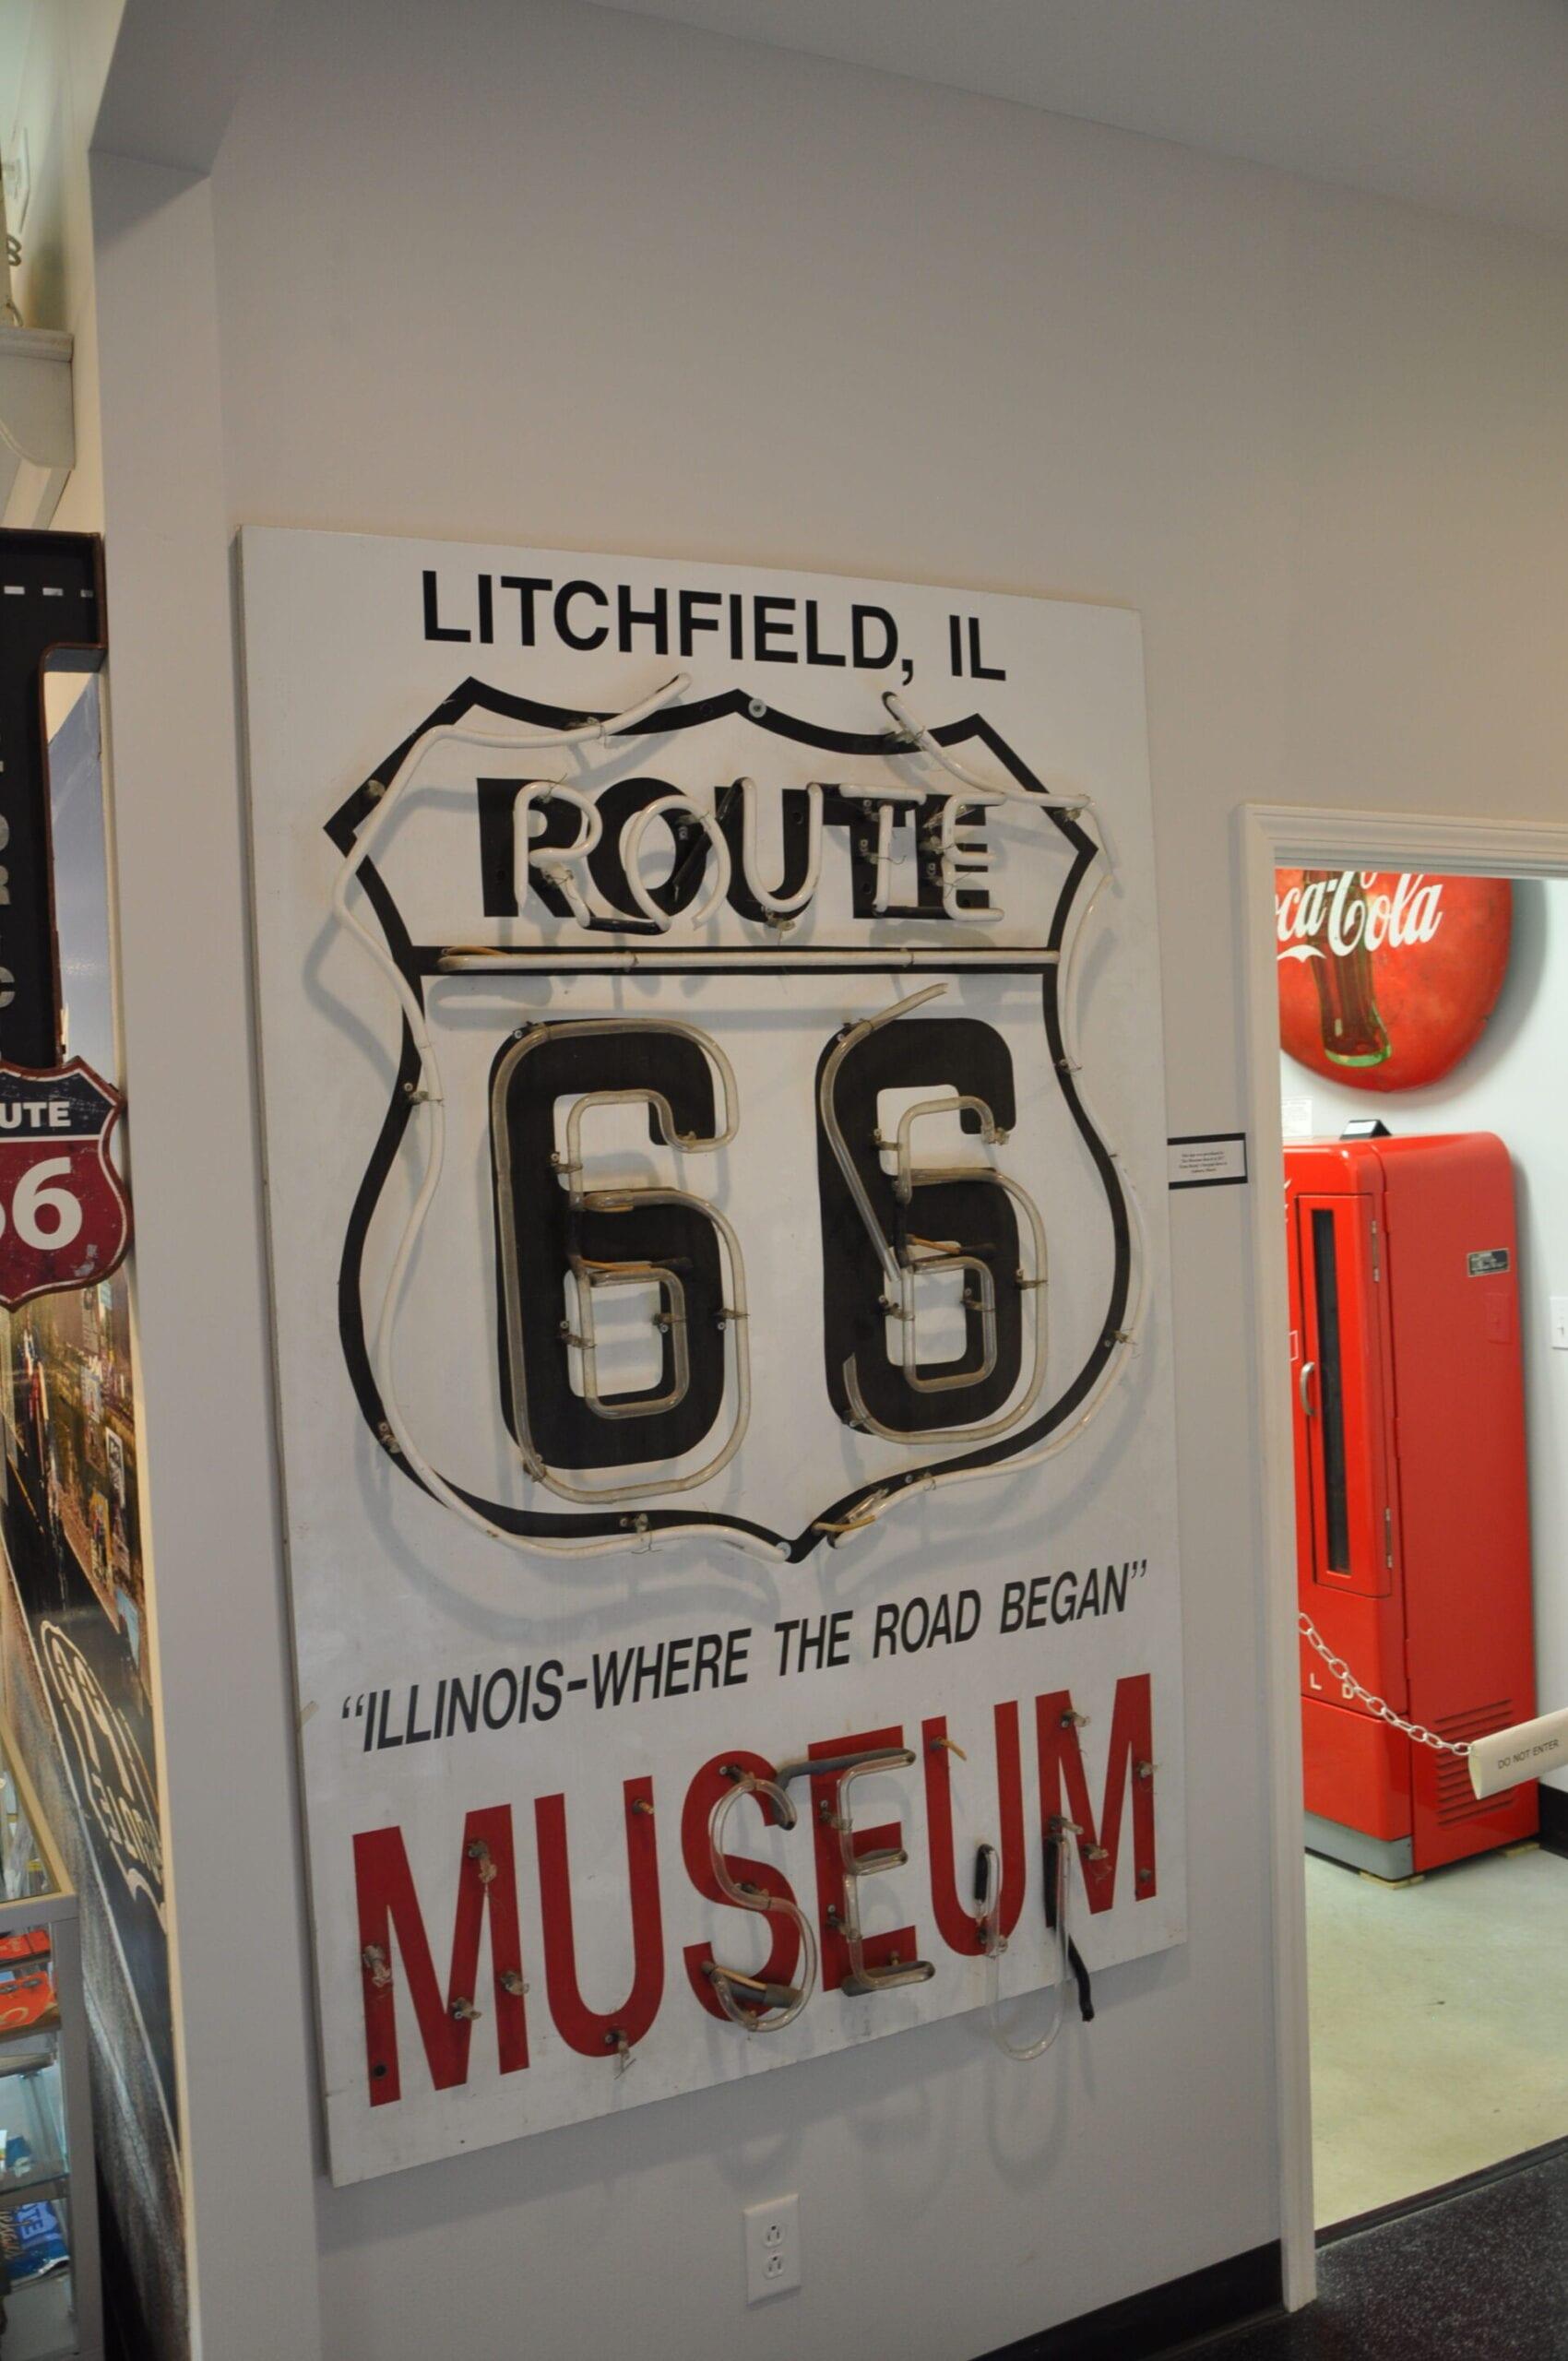 Litchfield Route 66 Museum